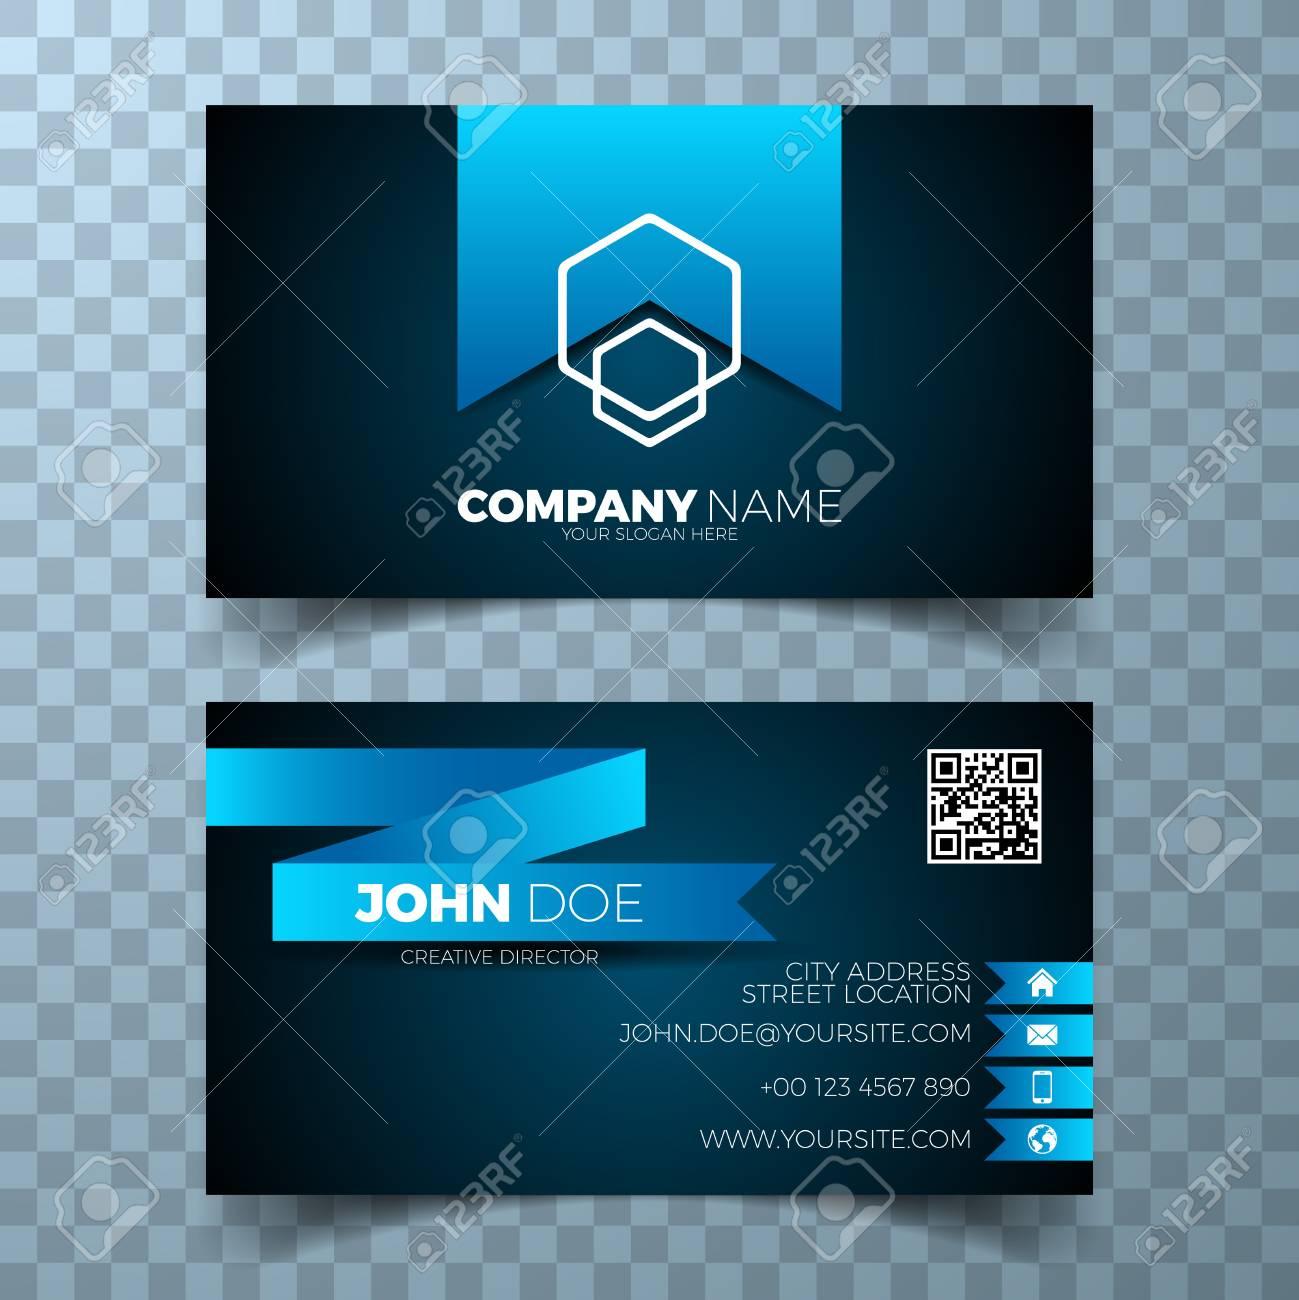 Vector modern business card design template on a clean backgound. - 82478710